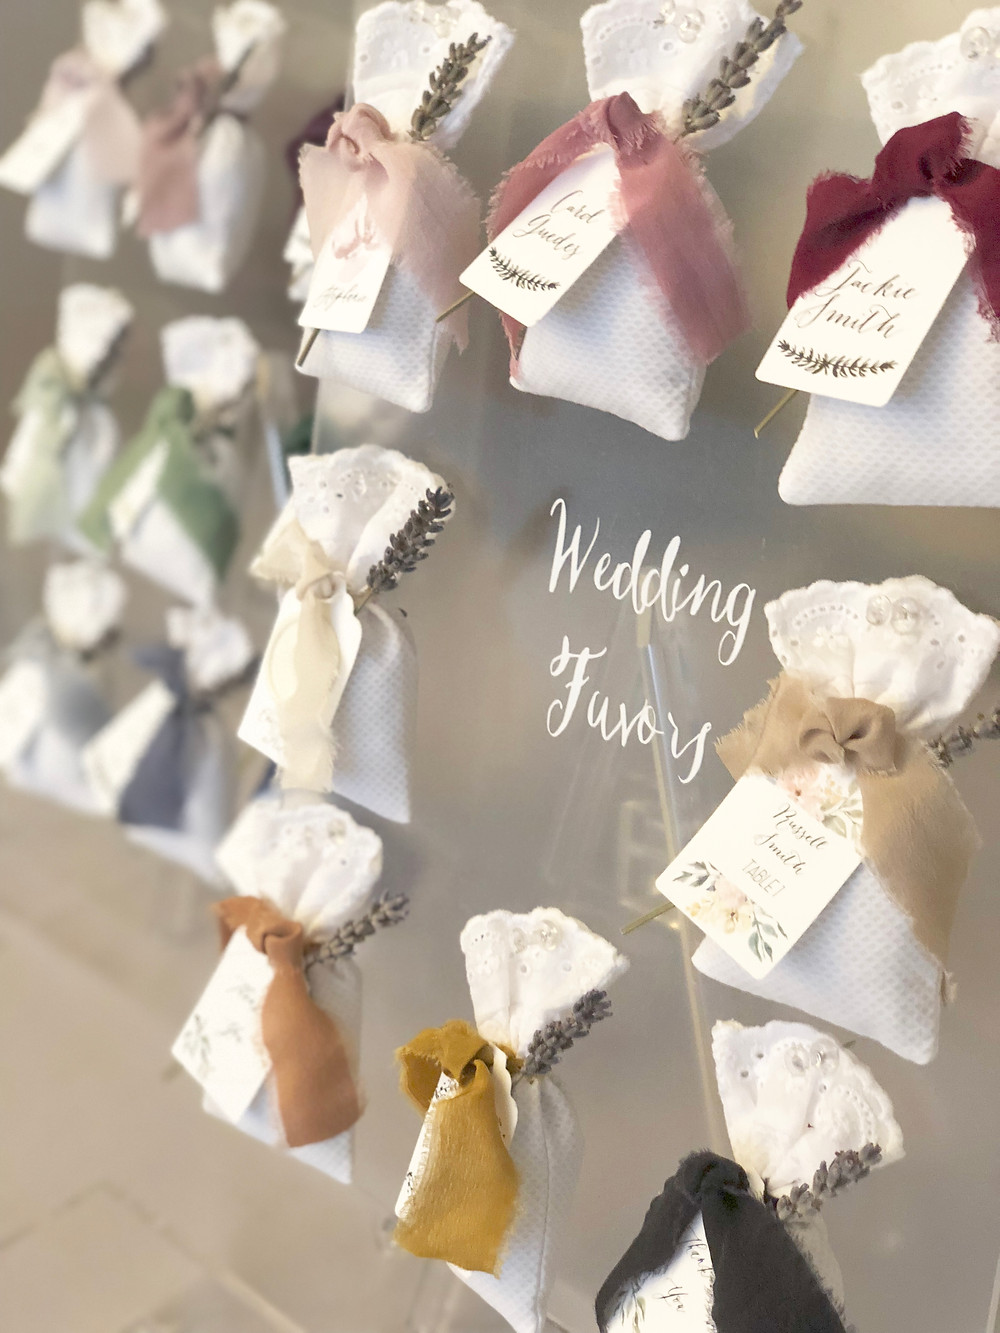 Dried Lavender Wedding Favors Display